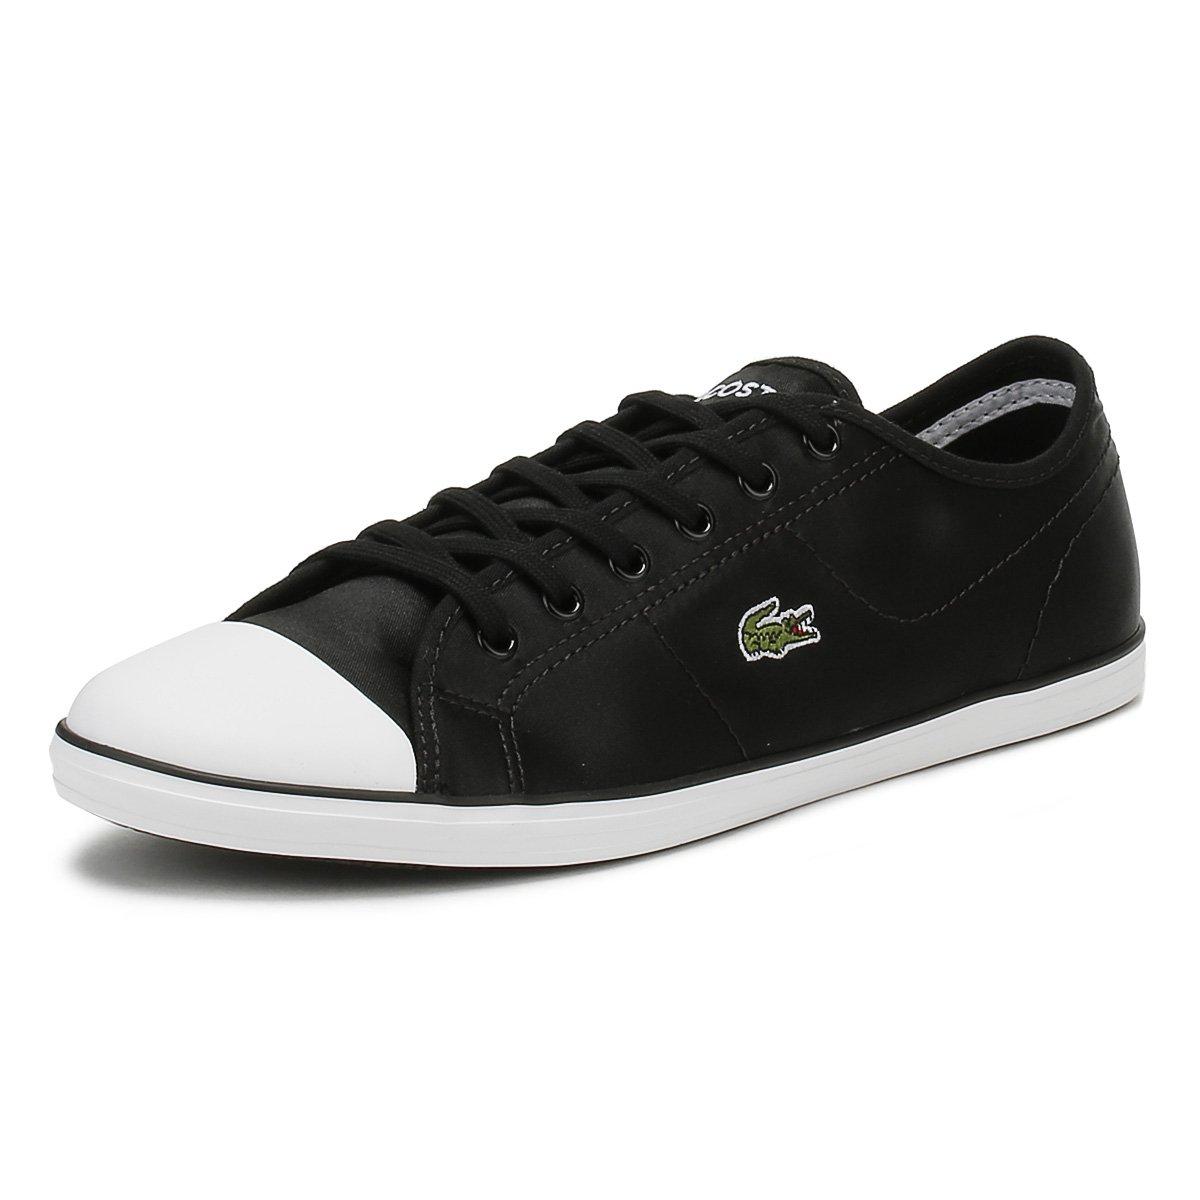 Lacoste Womens Black/White Ziane 118 2 Sneakers-UK 5